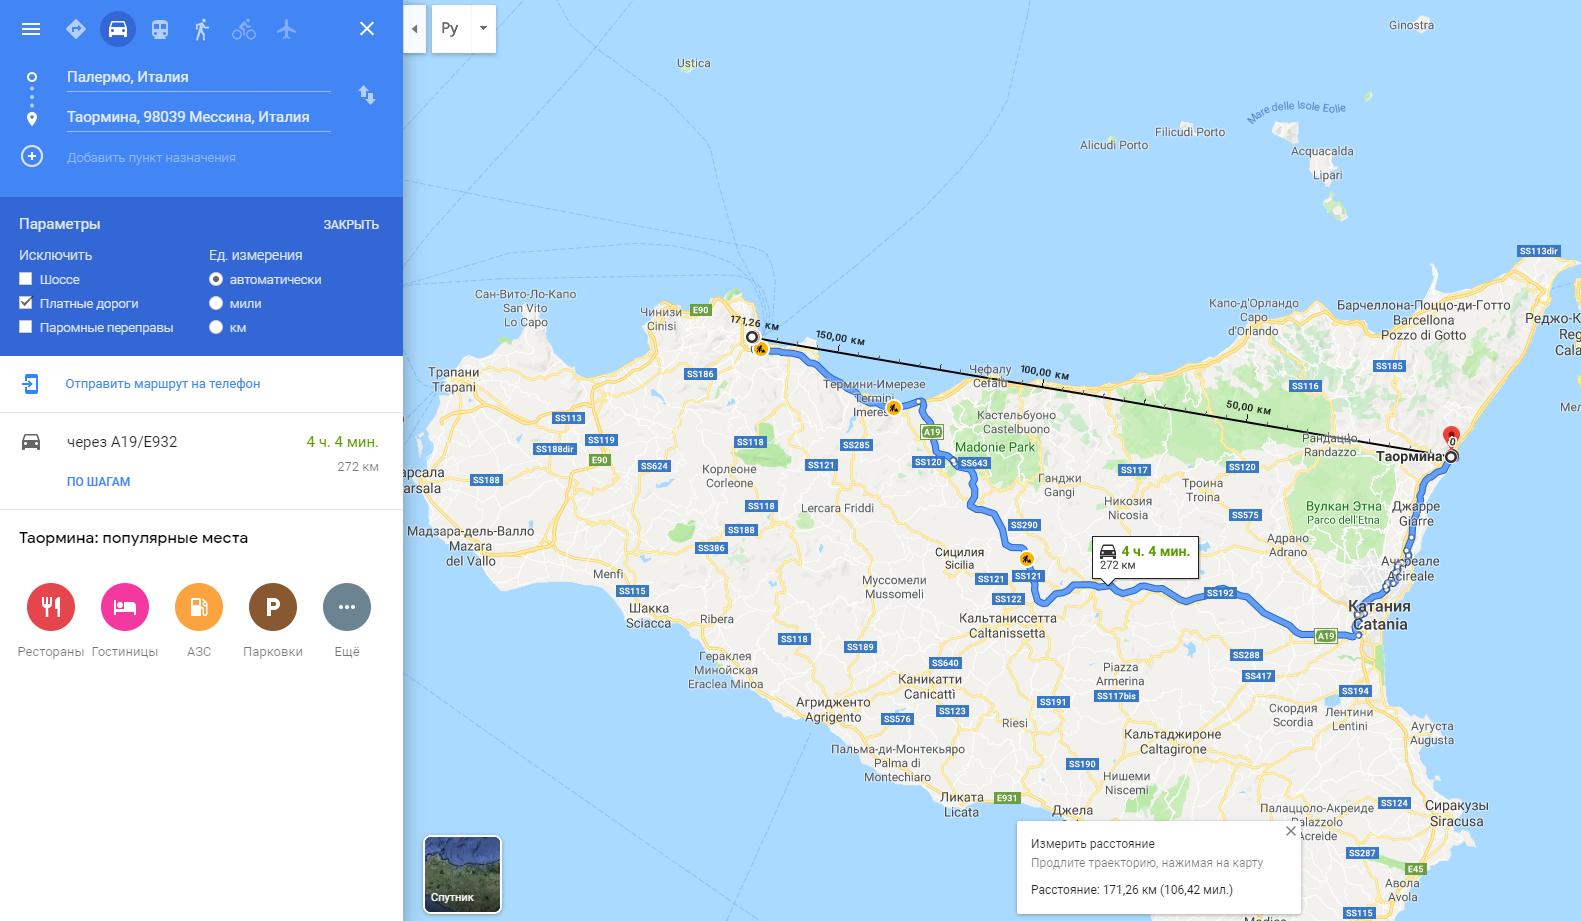 Добраться до Таормины из Палермо